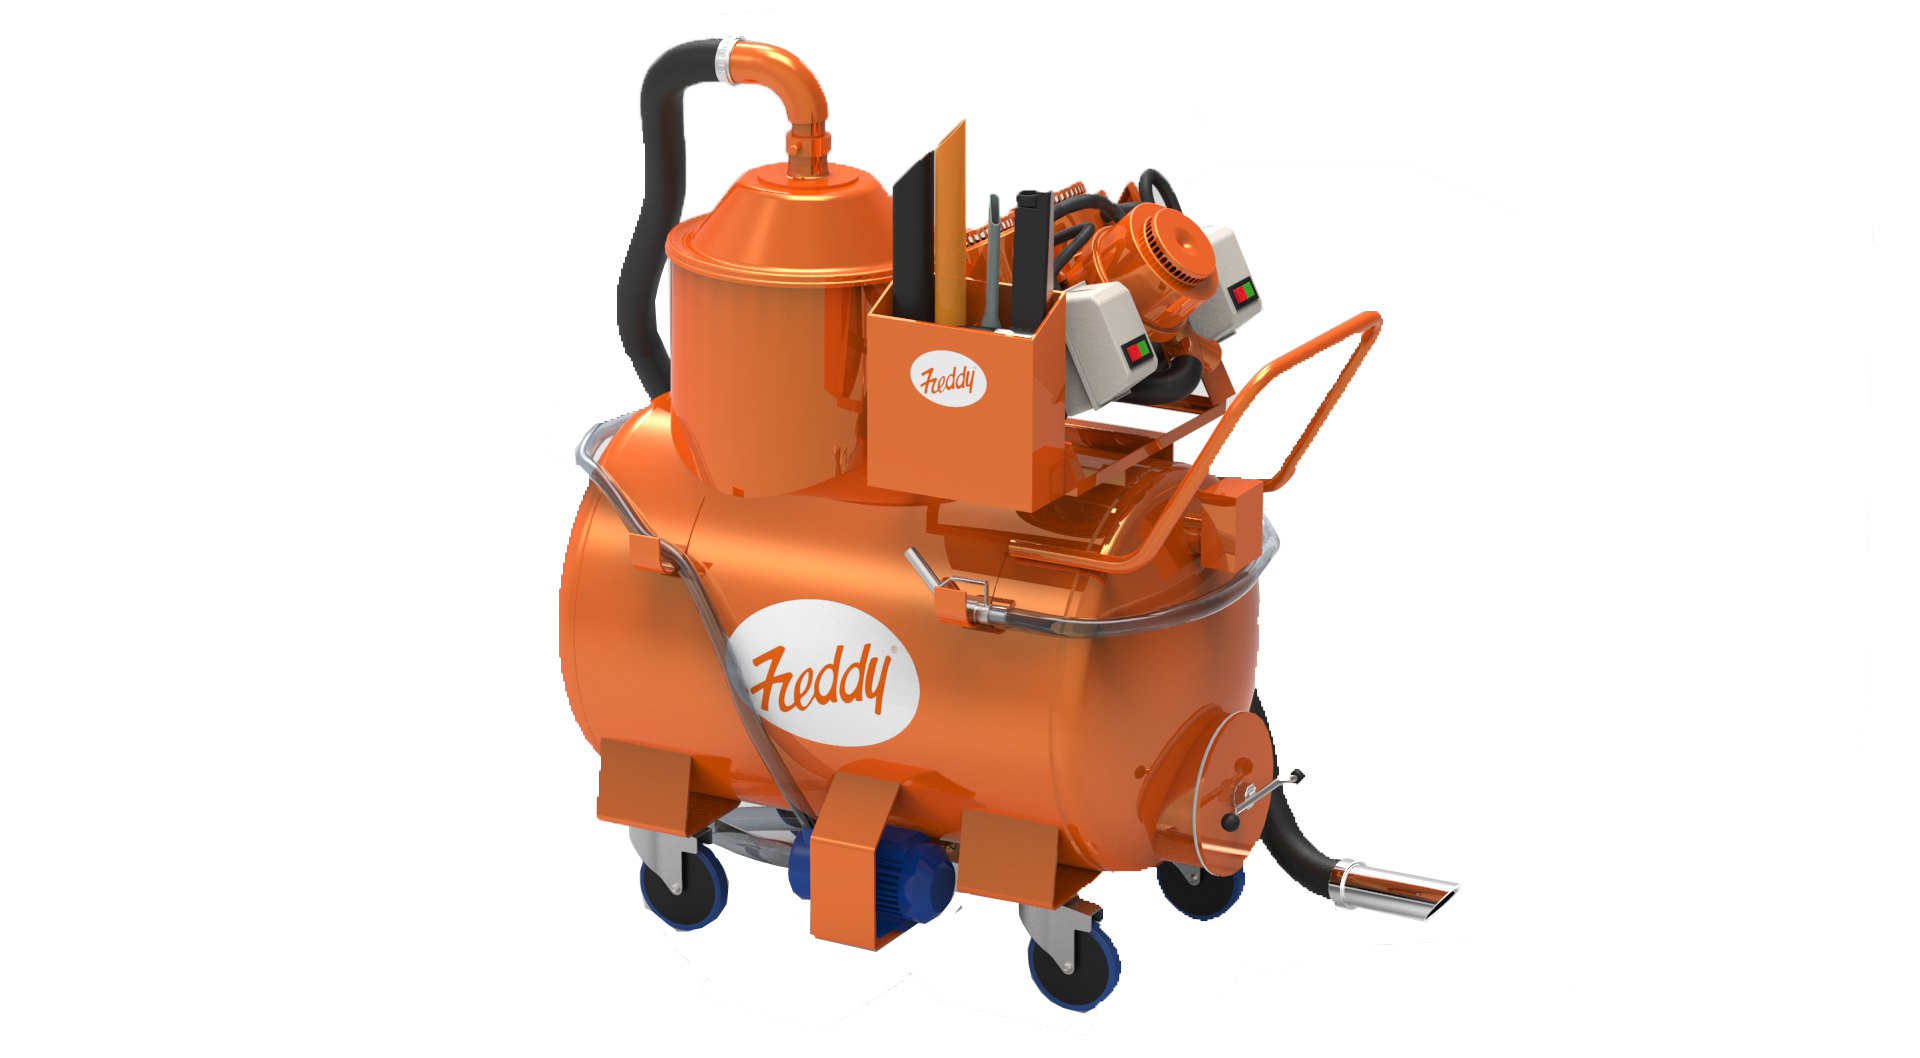 Coolant Filtration Machines